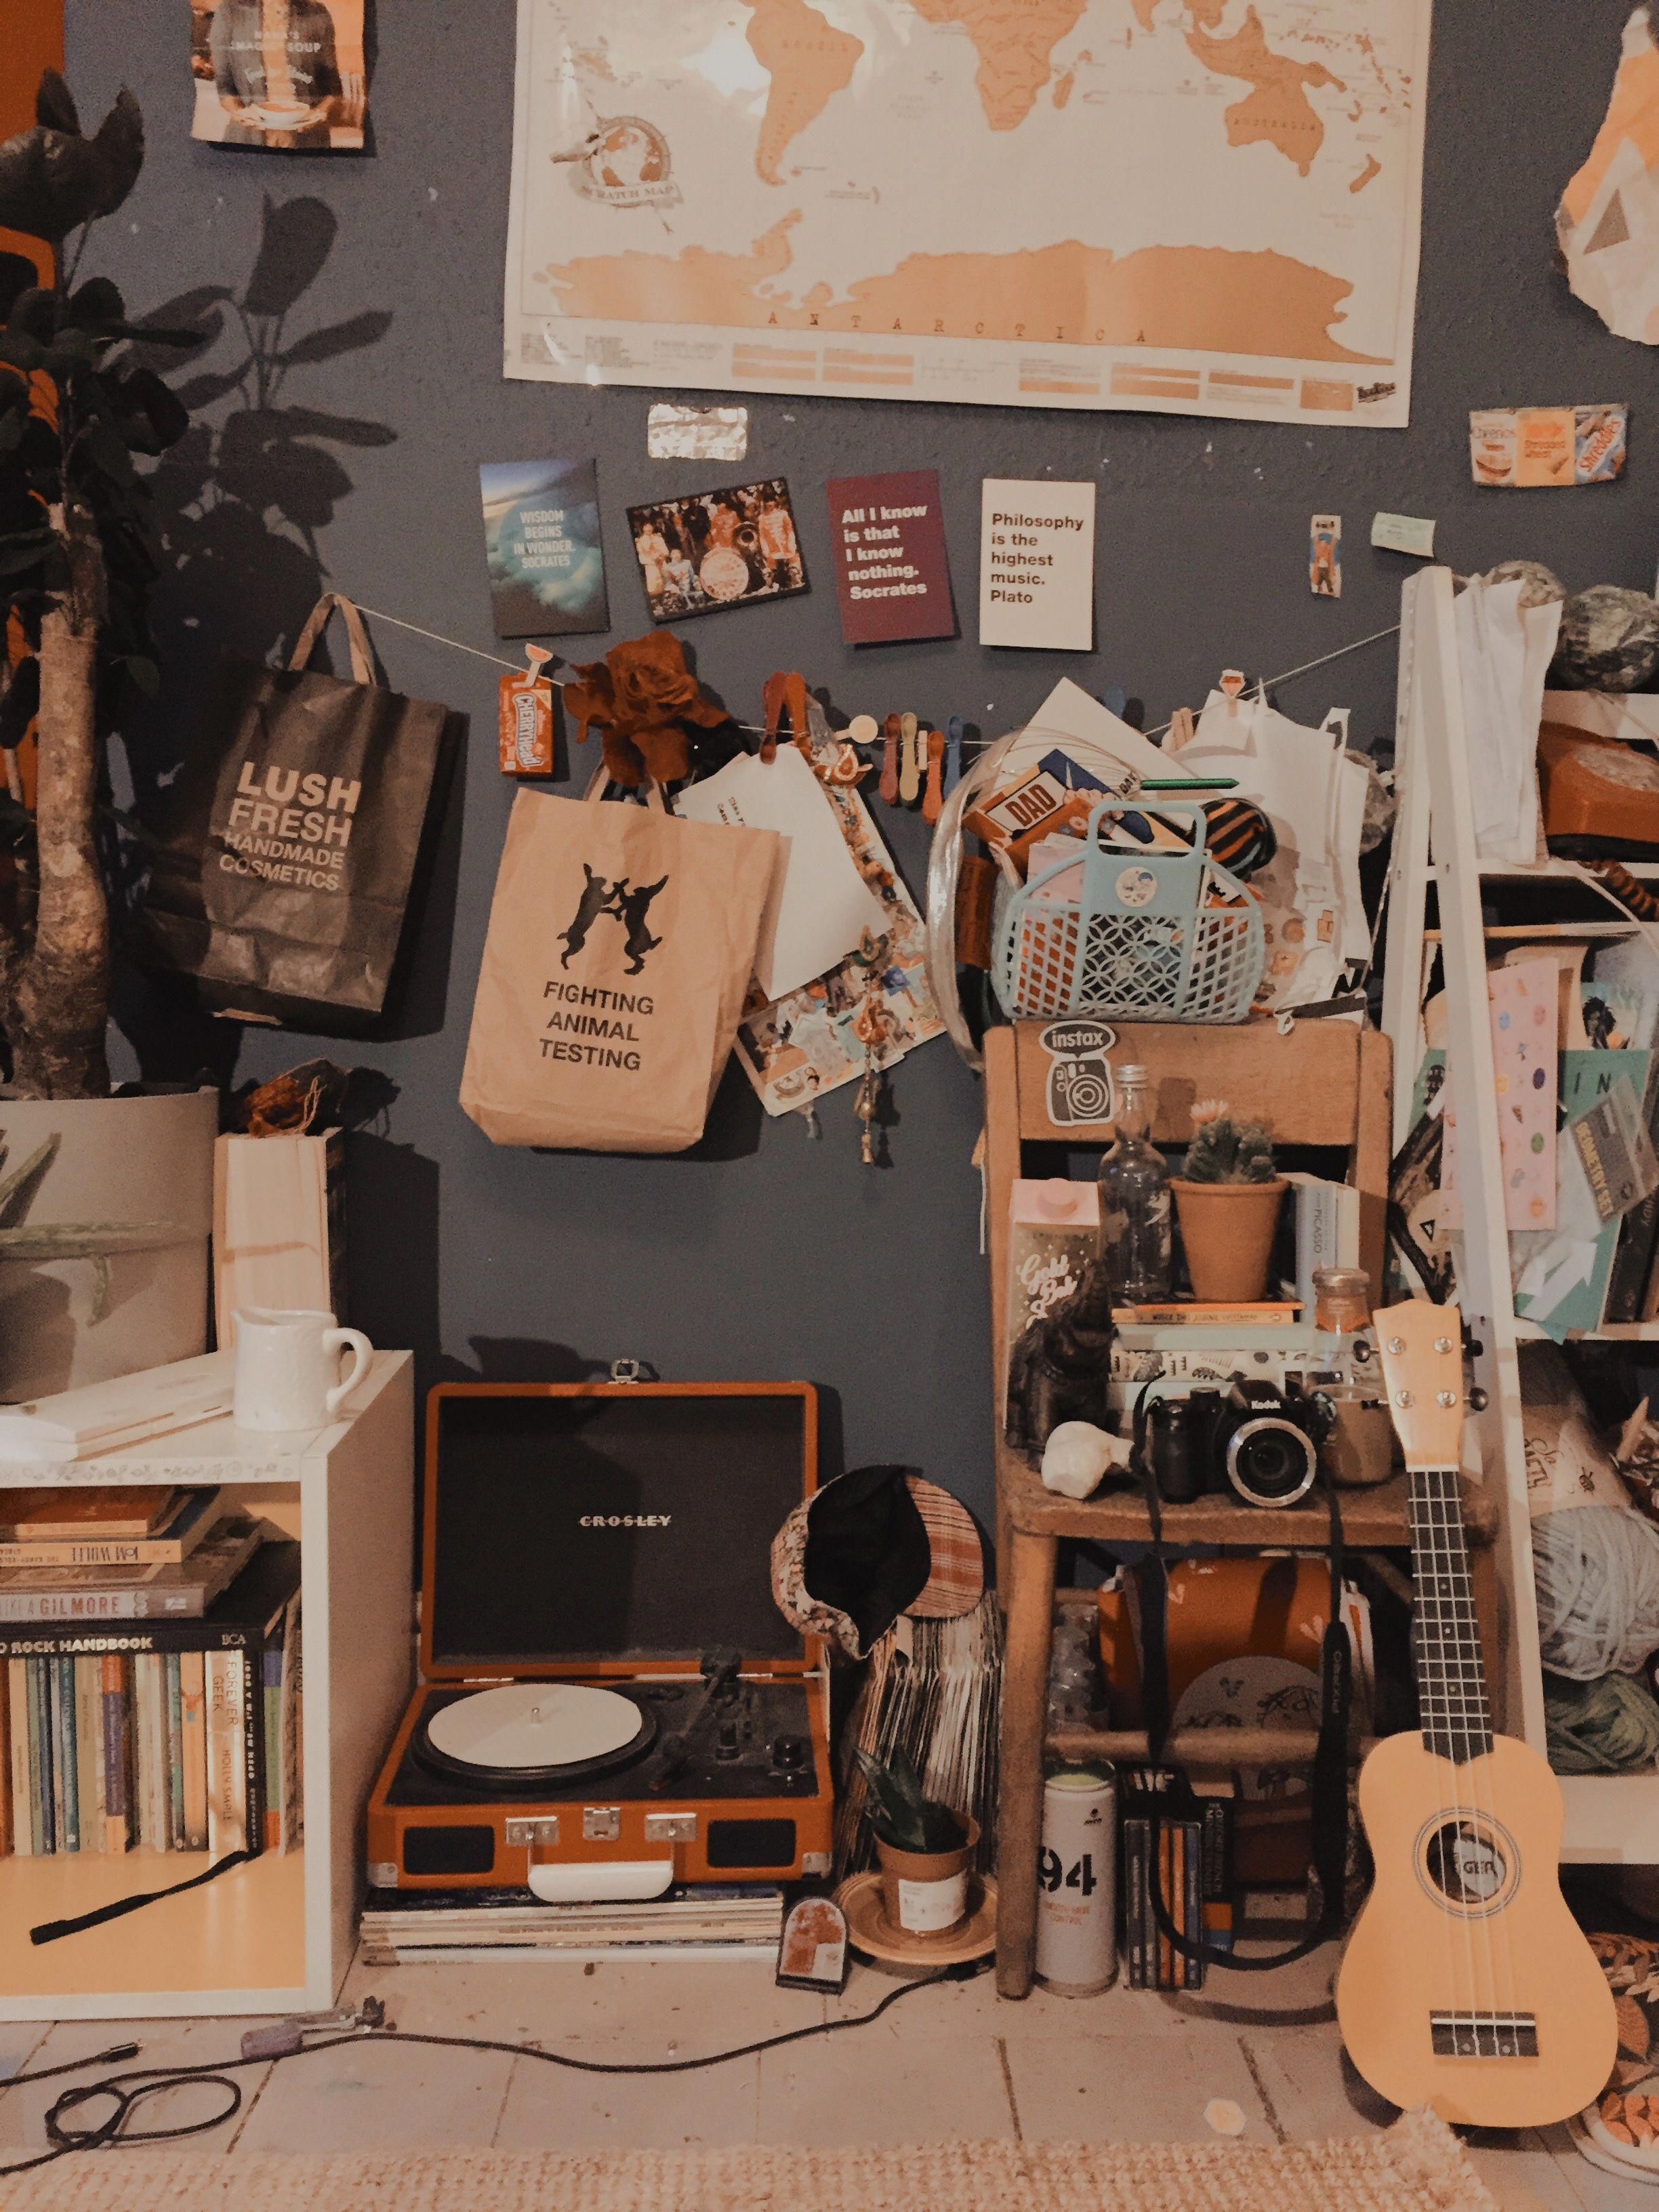 Haha Aesthetic Tumblr Cosy Room Inspiration Inspo Photography Instagram Bedroominspo Cosy Room Aesthetic Room Decor Retro Room